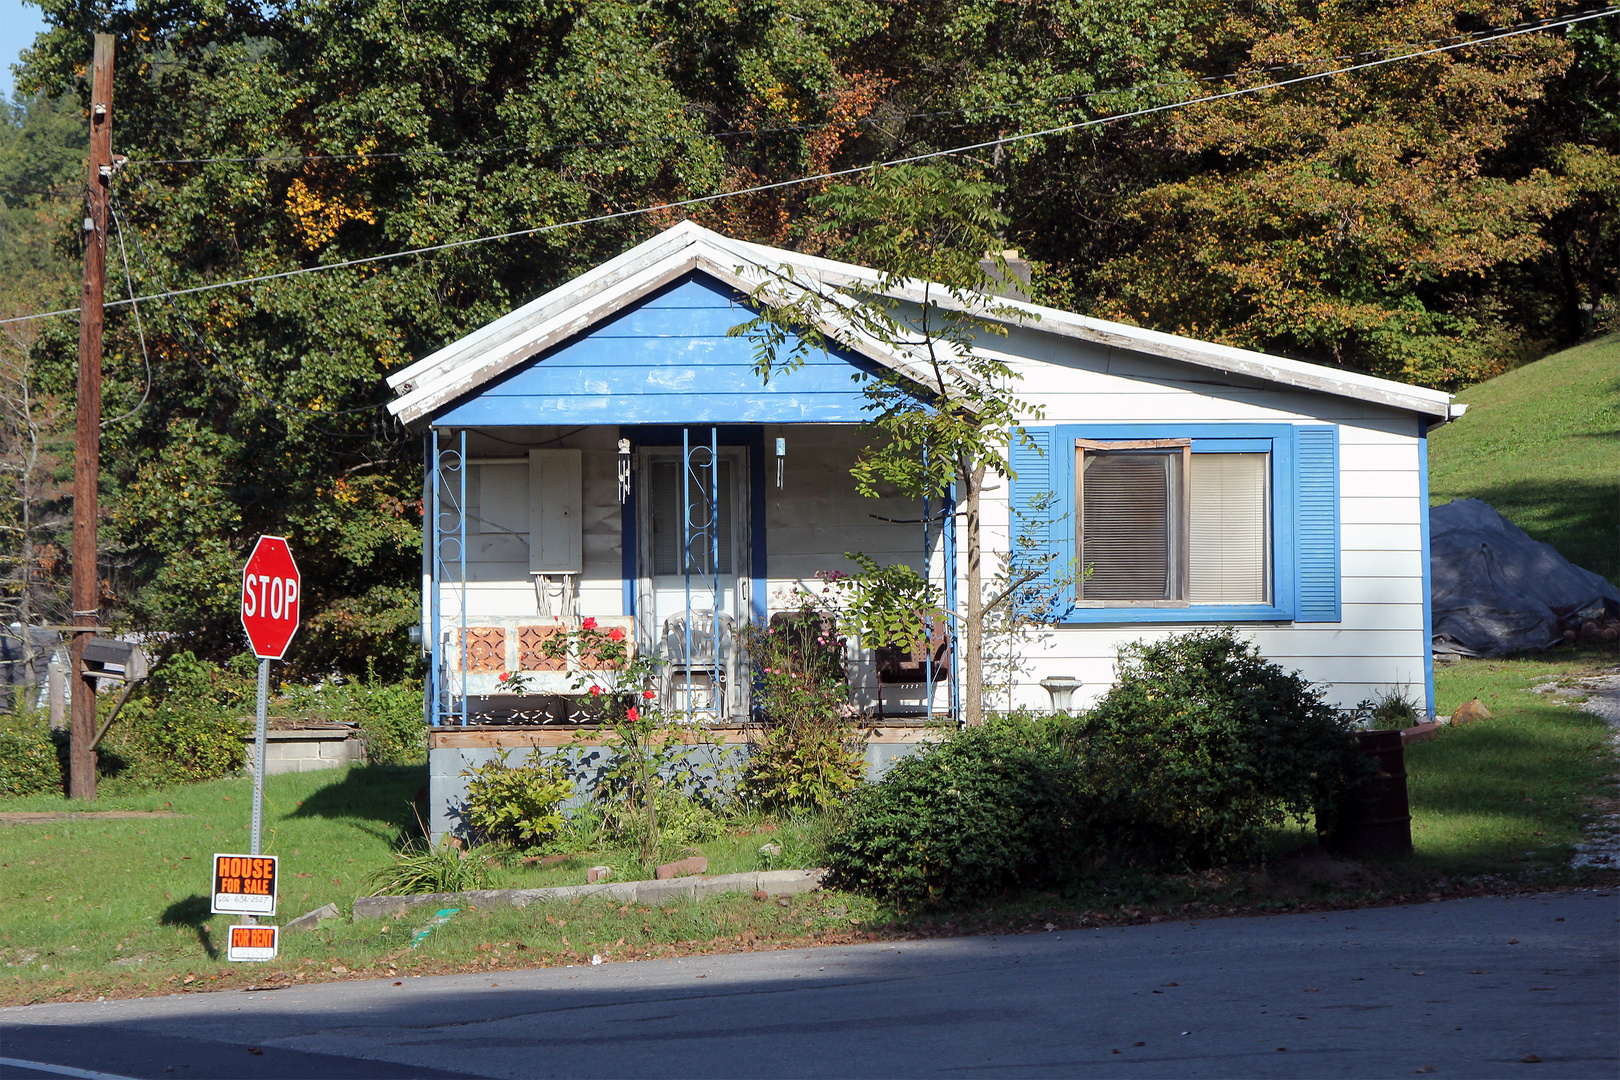 House for Sale, For Rent, Folgen der Wirtschaftslage in West Virginia, Kentucky, USA 2013